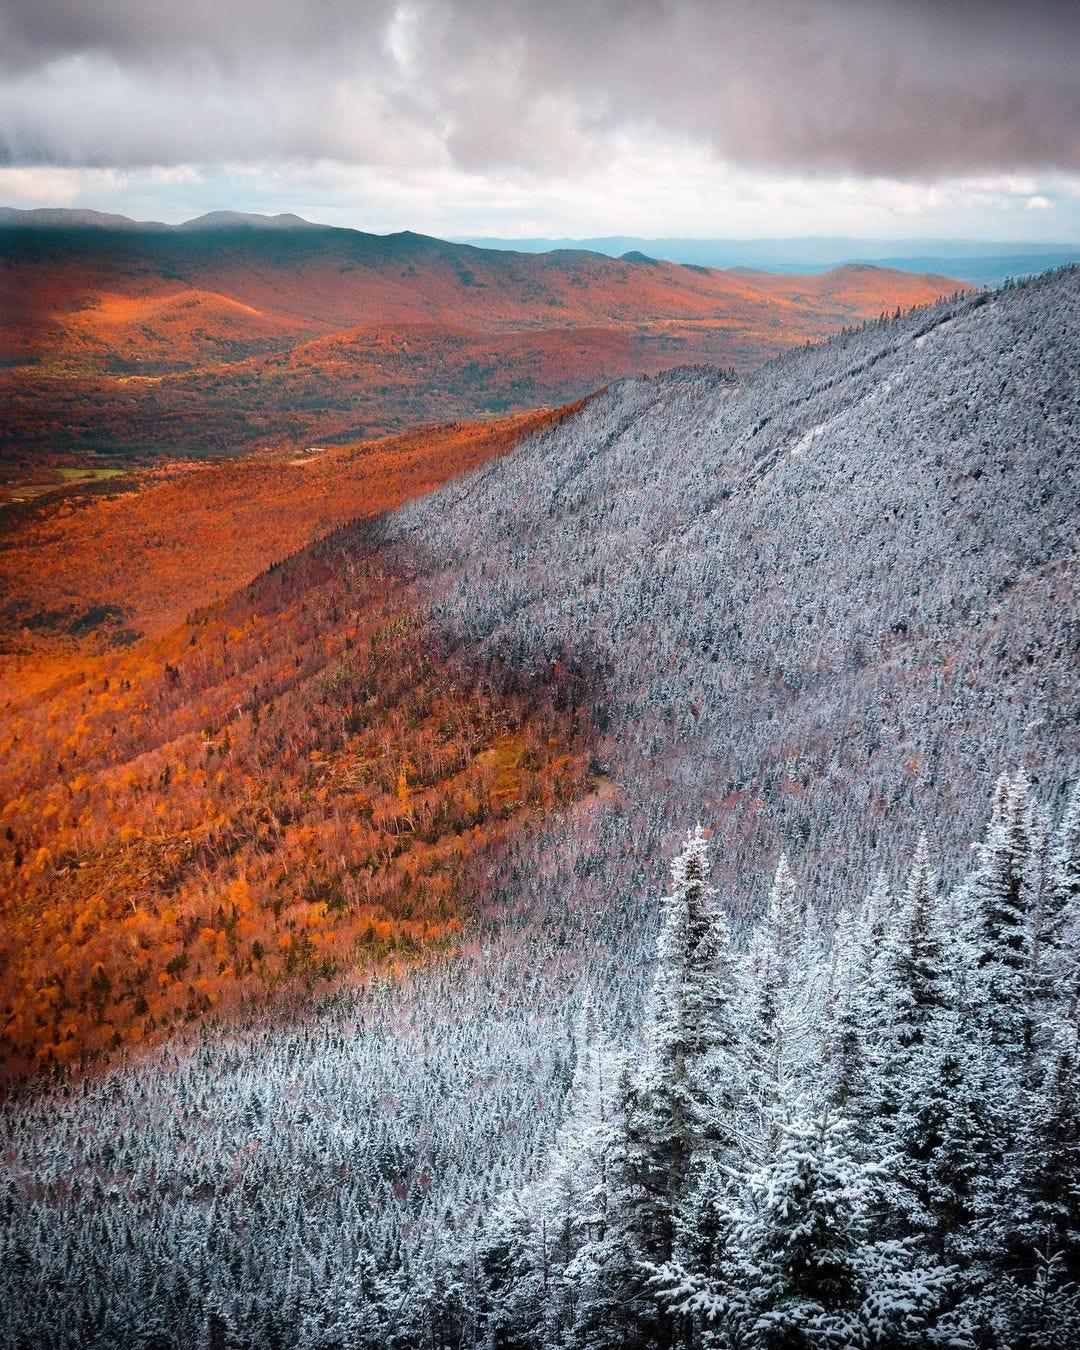 Mountain landscape with half frozen half not